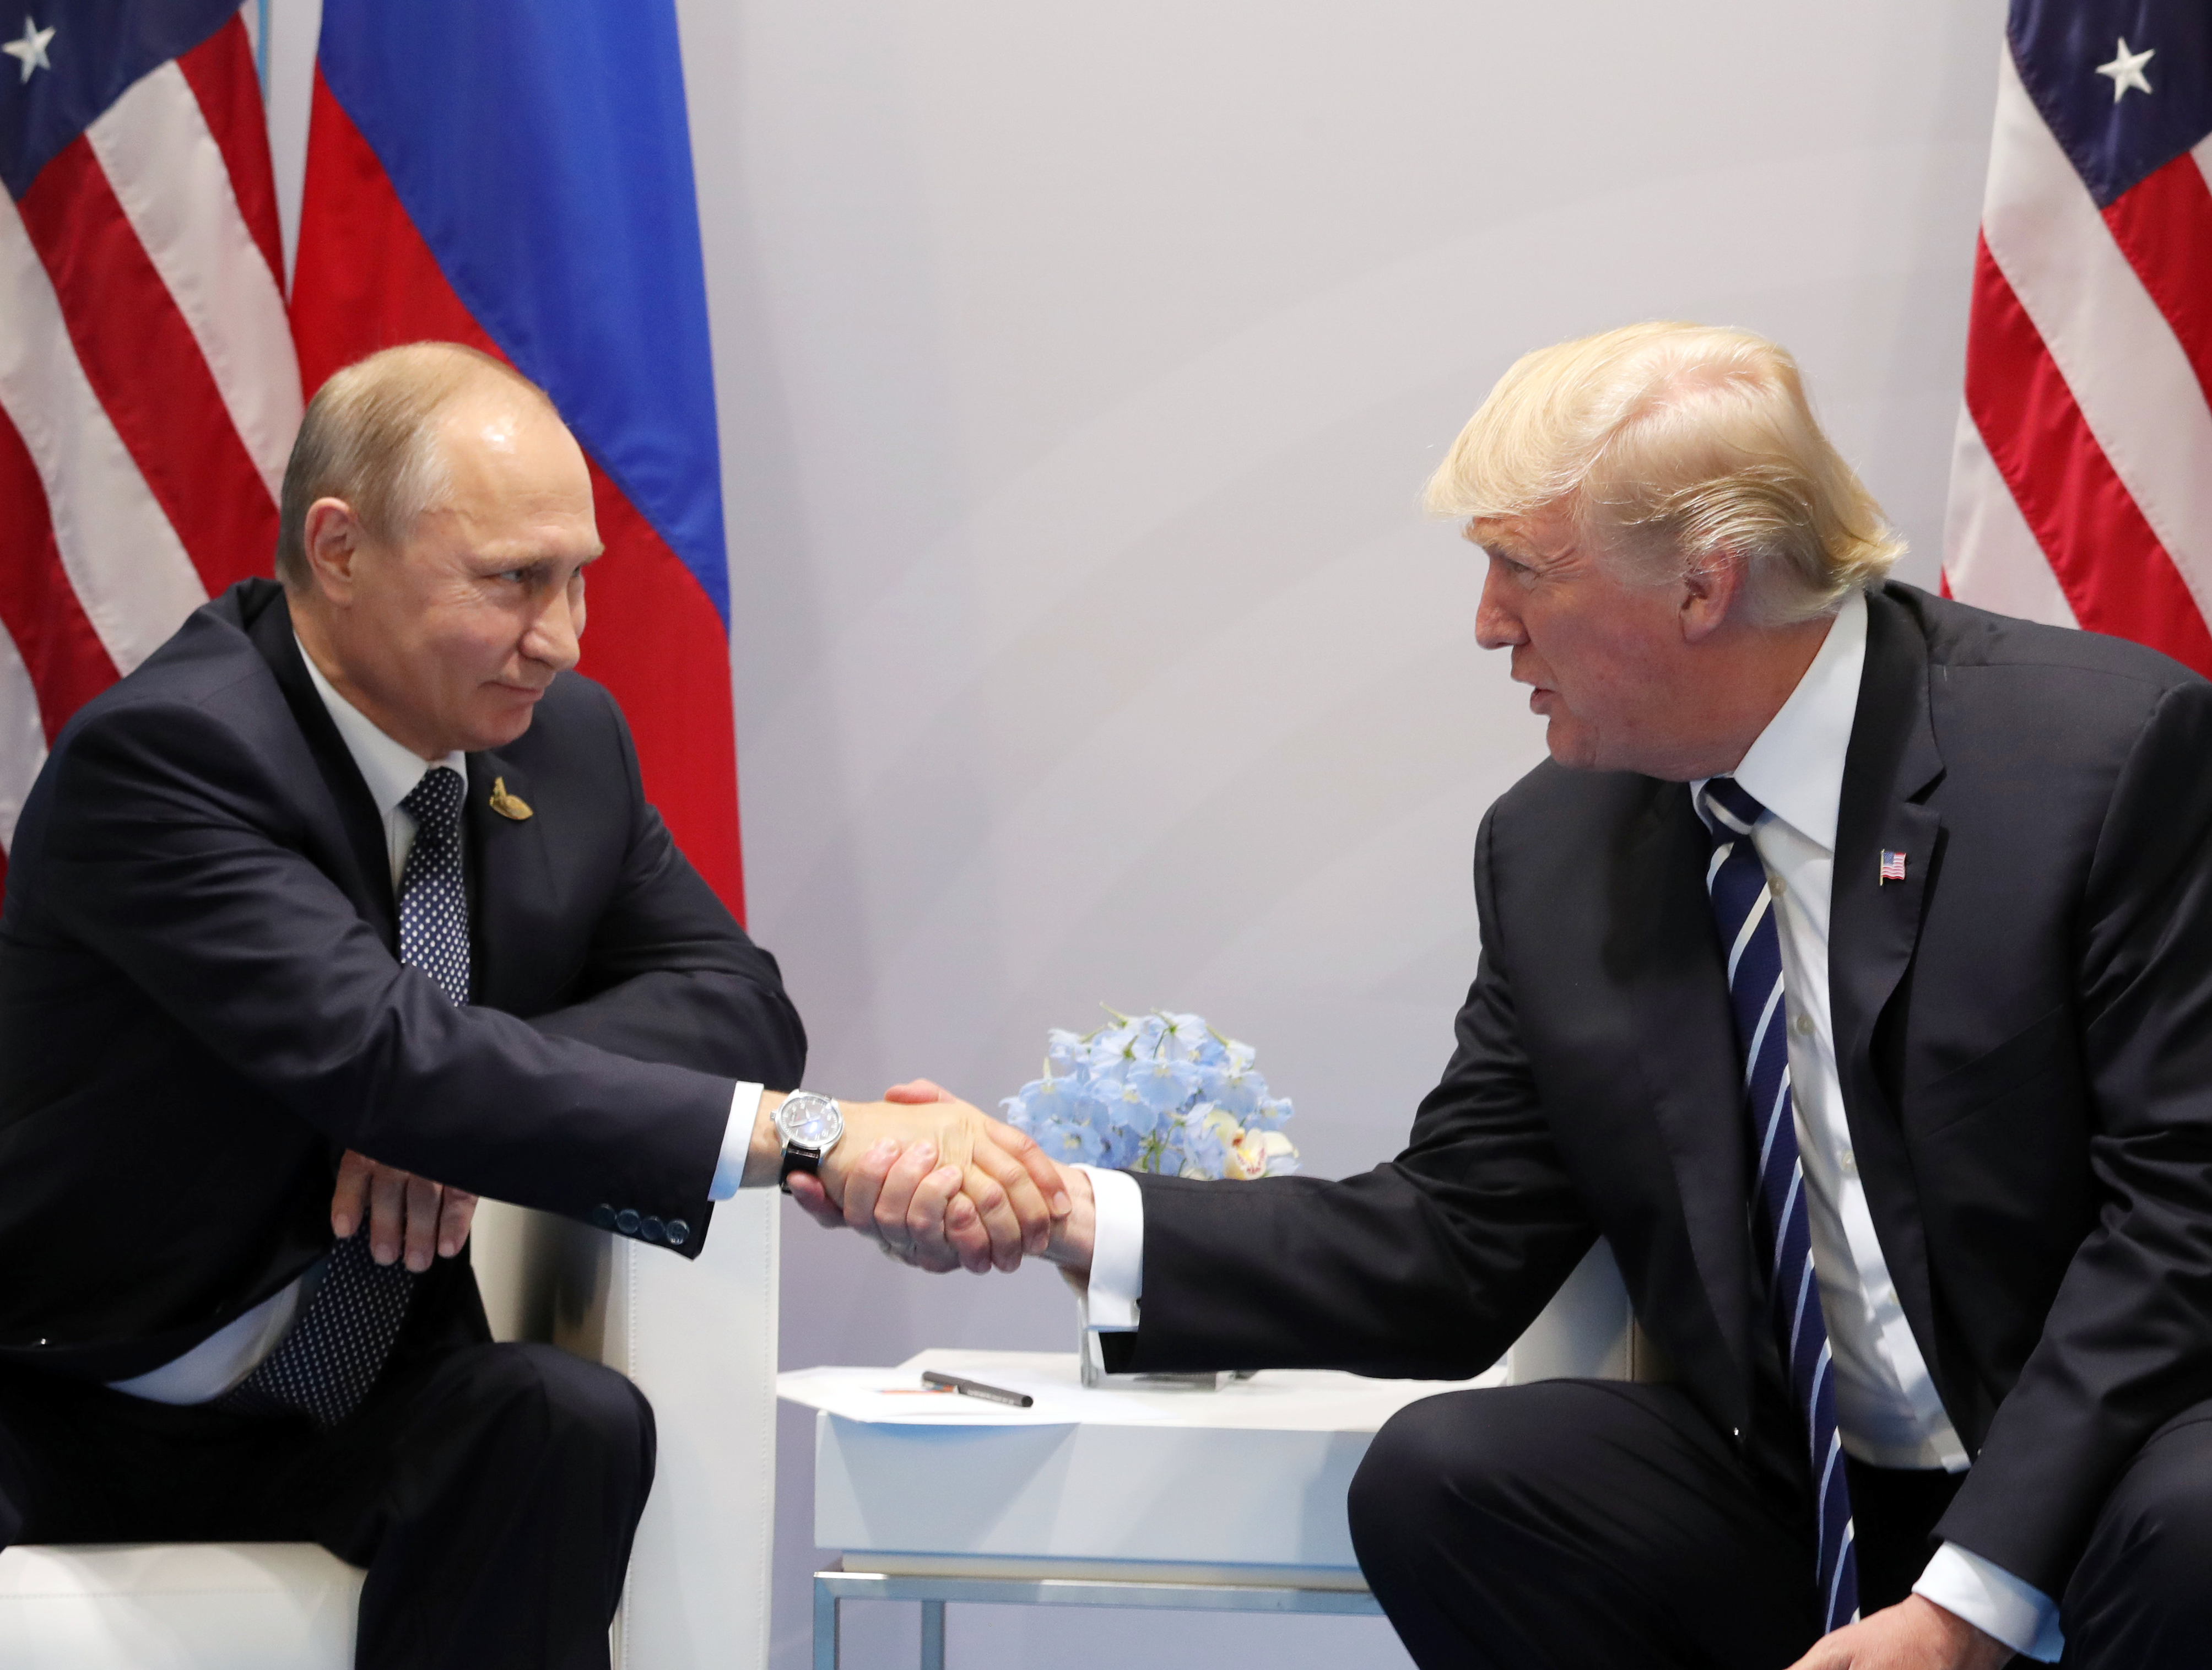 Трамп поведал о способностях сотрудничества РФ иСША